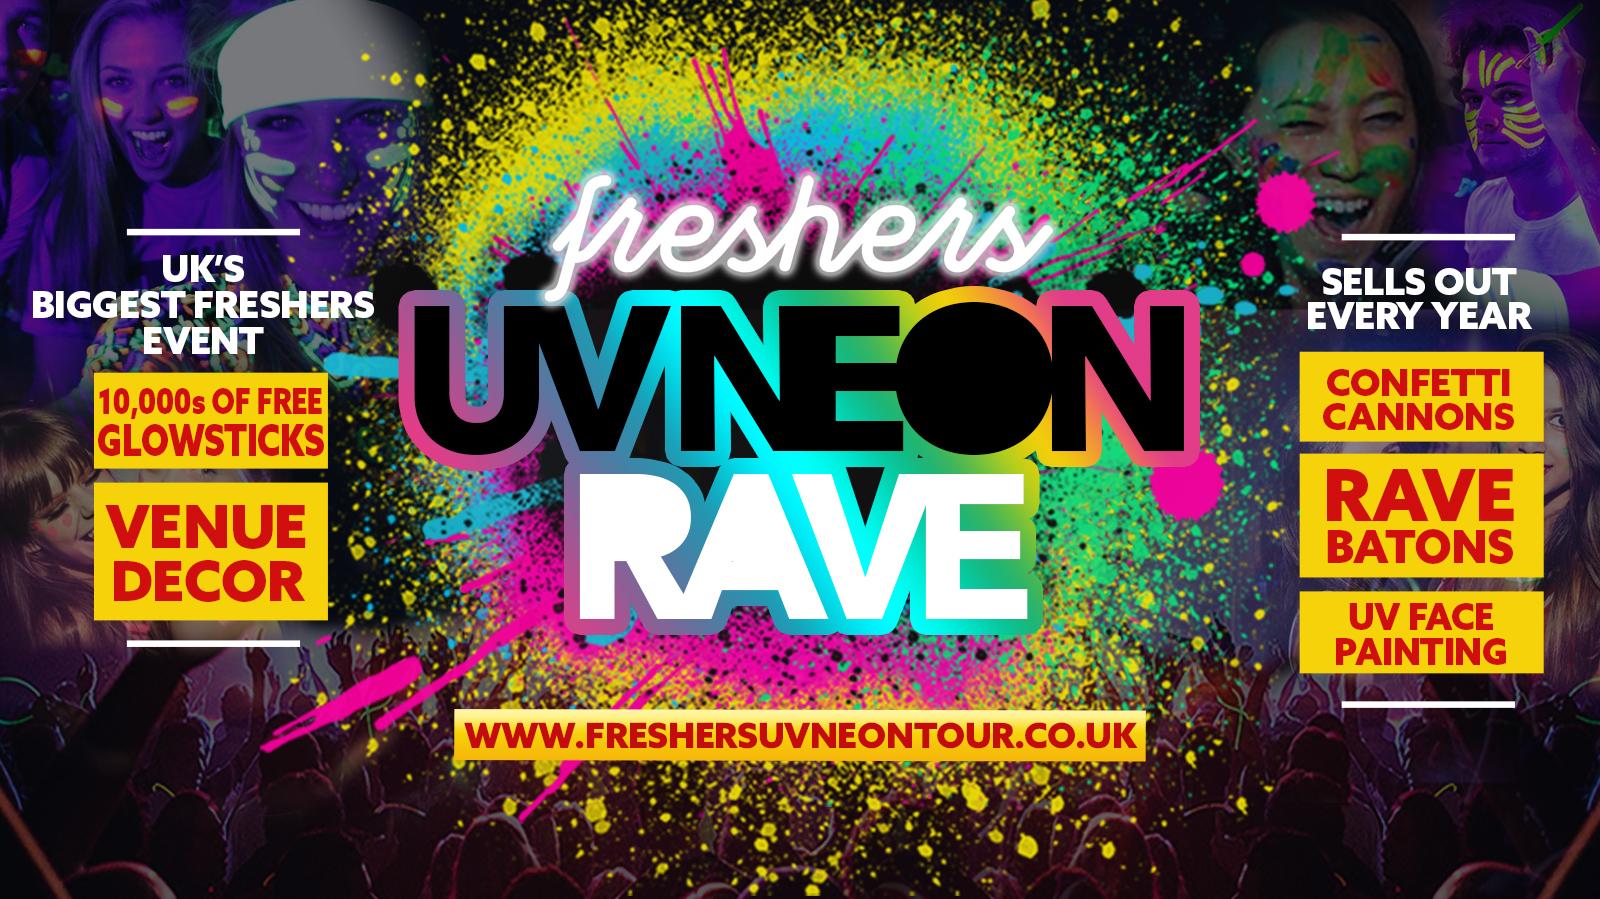 Manchester Freshers UV Neon Rave | Manchester Freshers 2021 – Week 1